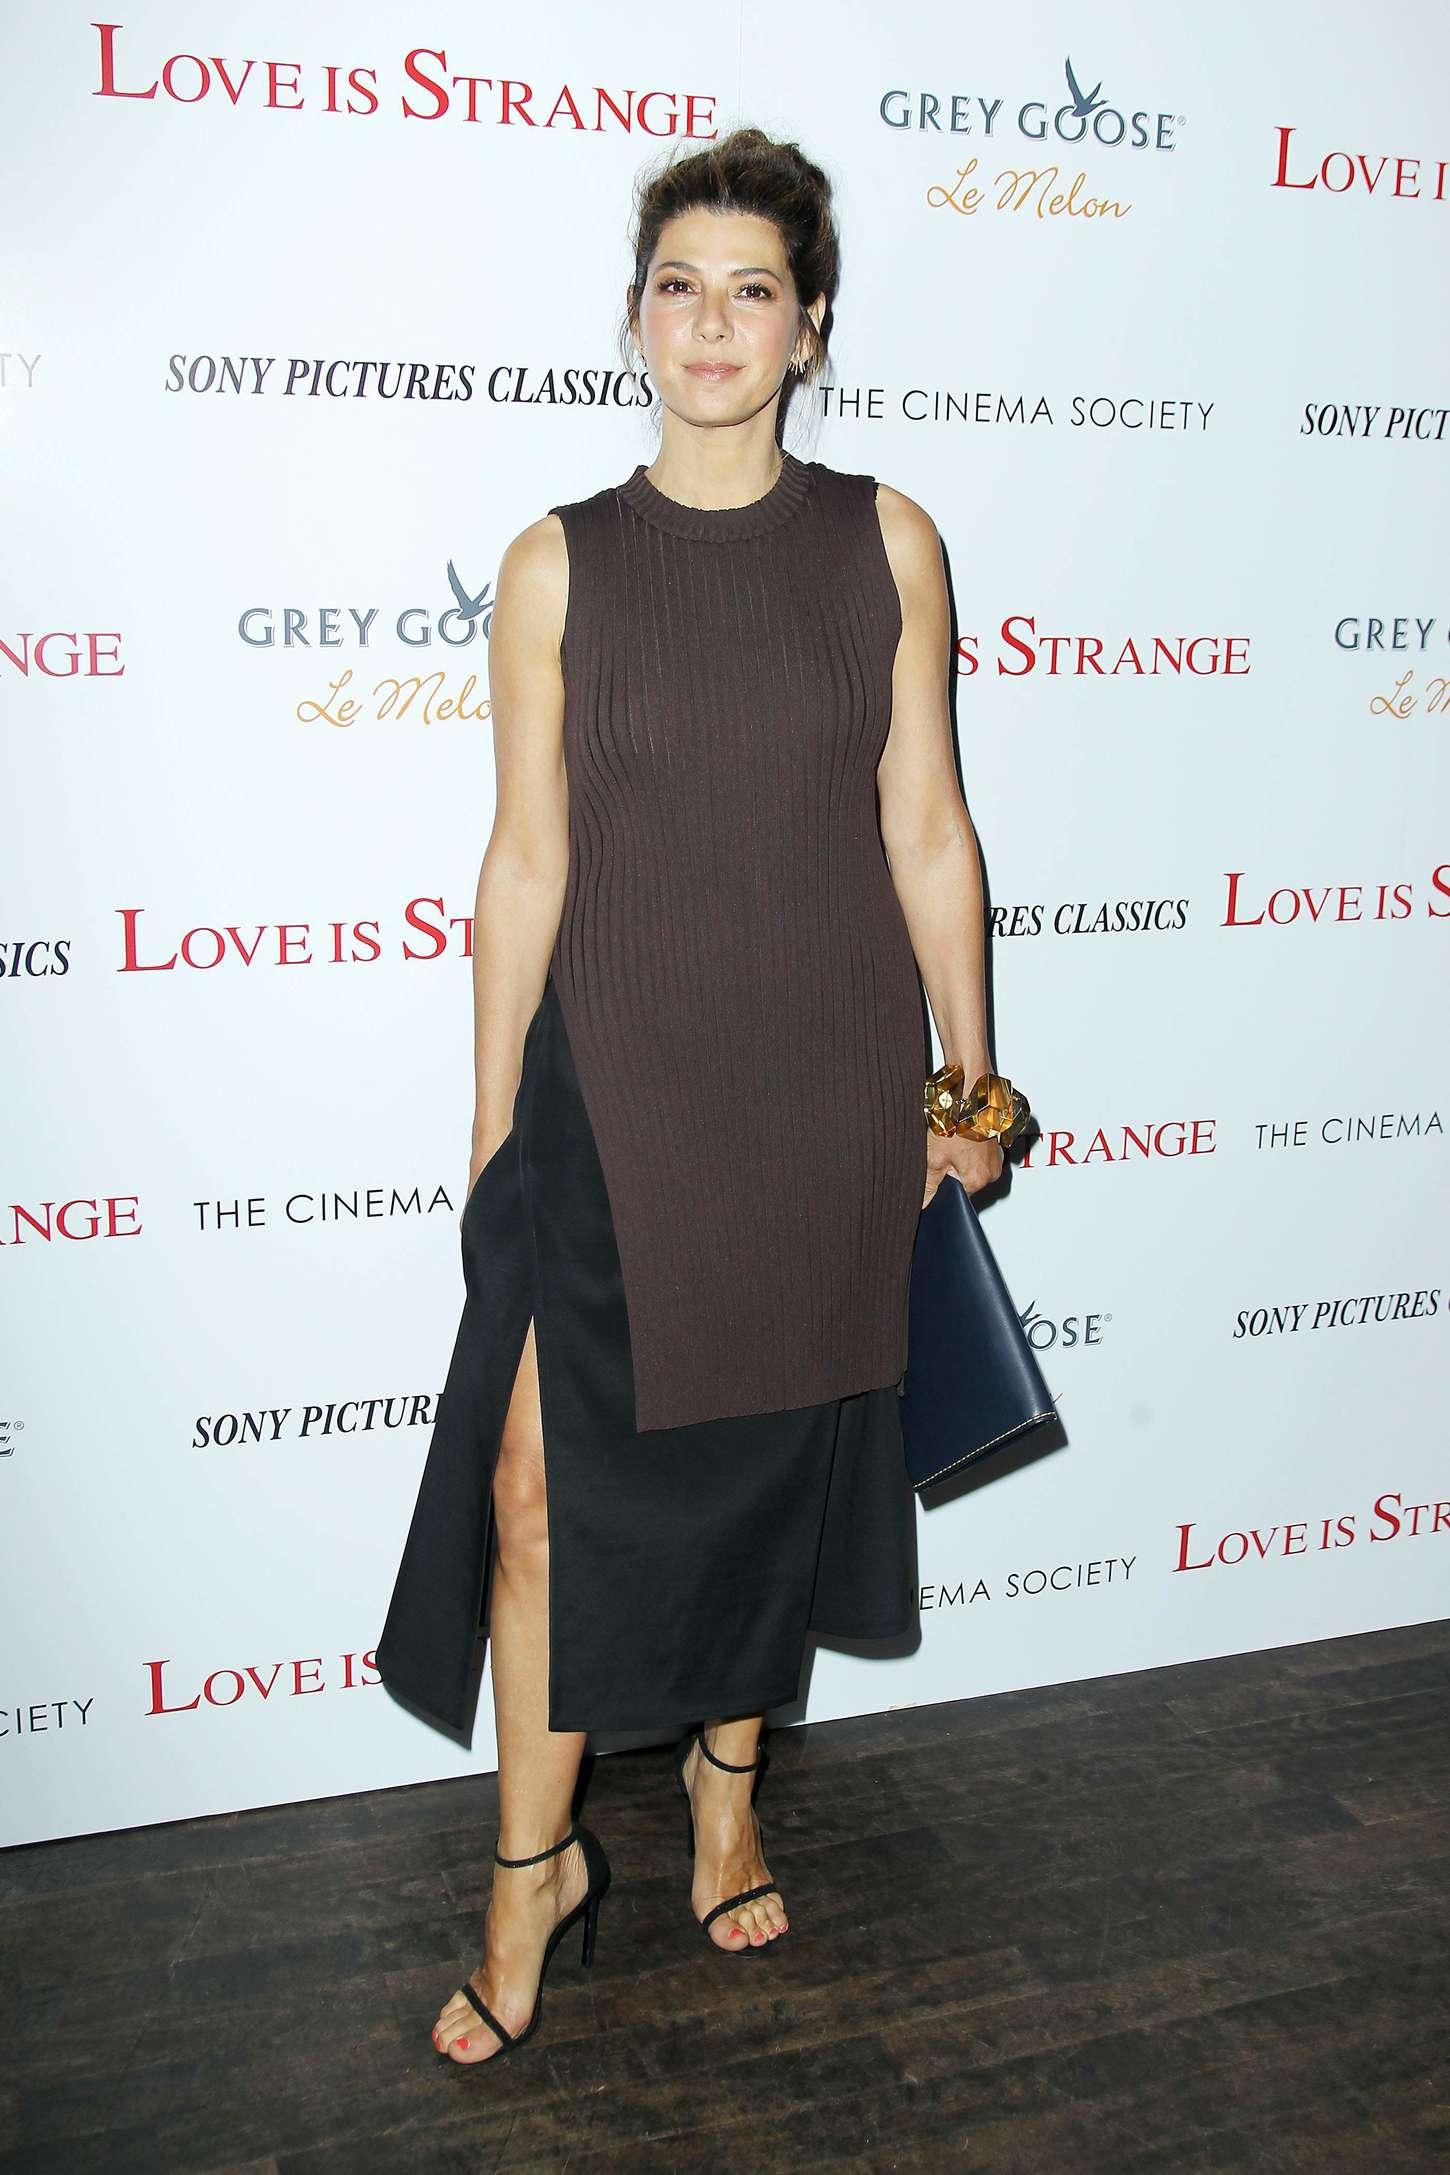 Marisa Tomei Love Is Strange Screening in New York City